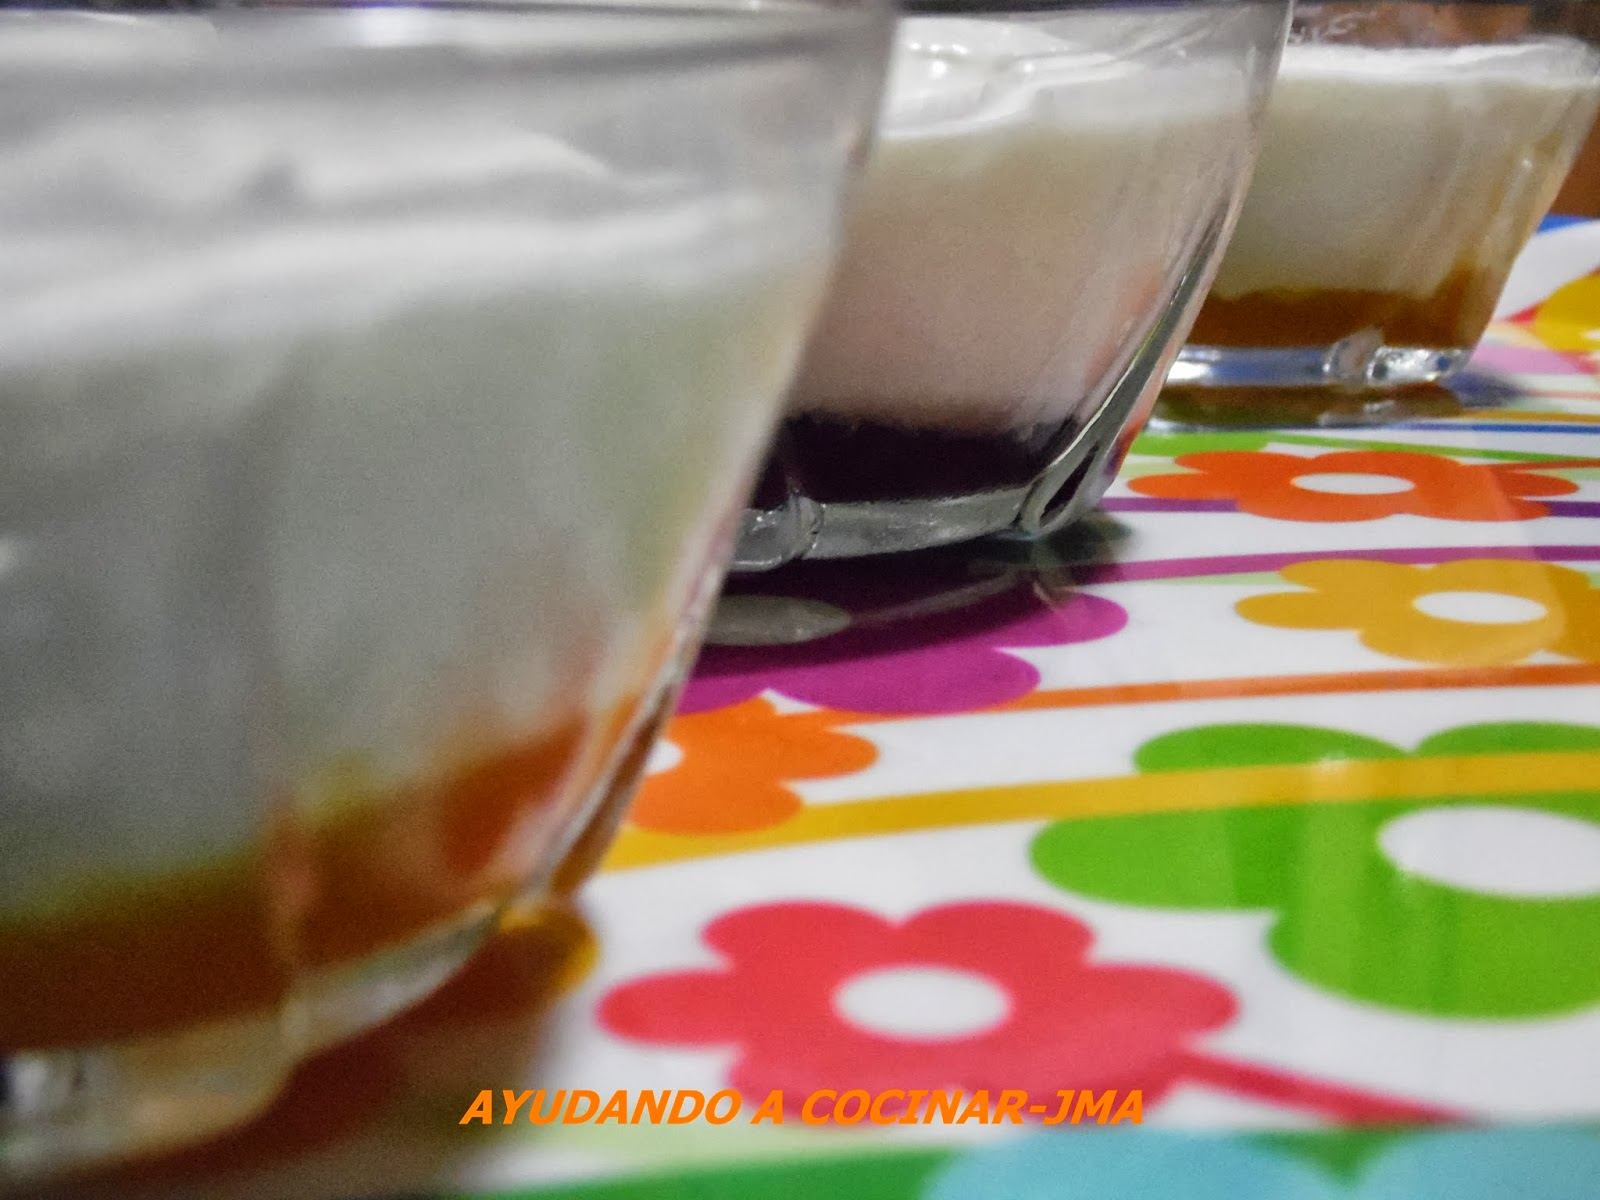 Ayudando a cocinar mousse de yogurt griego con mermelada - Como hacer mousse de yogurt ...